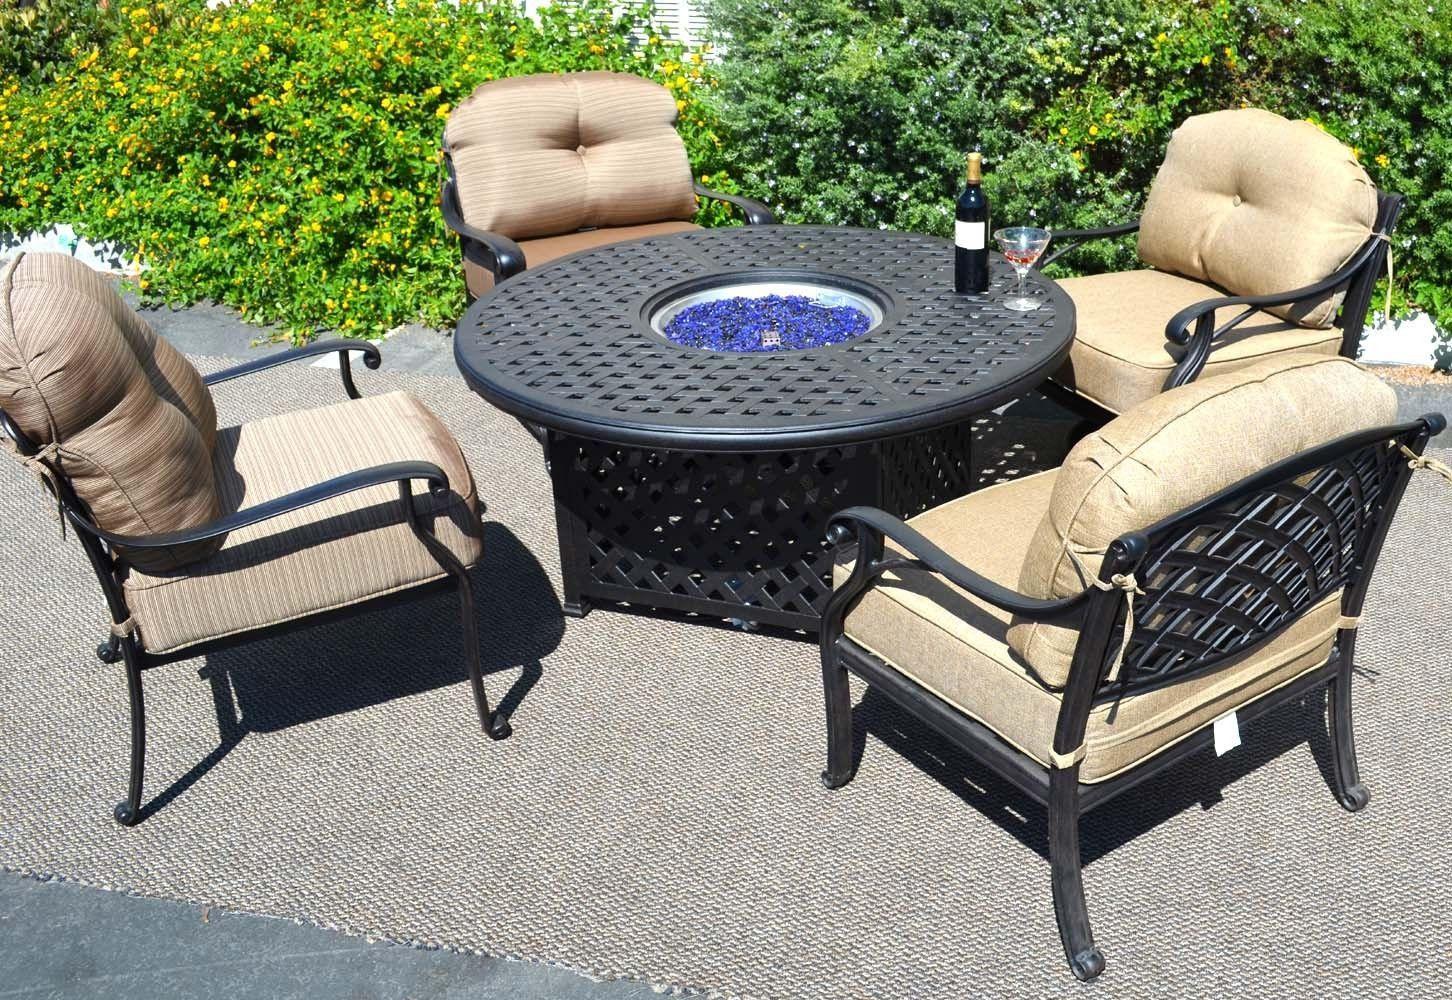 Propane Fire Pit Table Set  Propane Fire Pit 5pc Set Conversation Patio Furniture